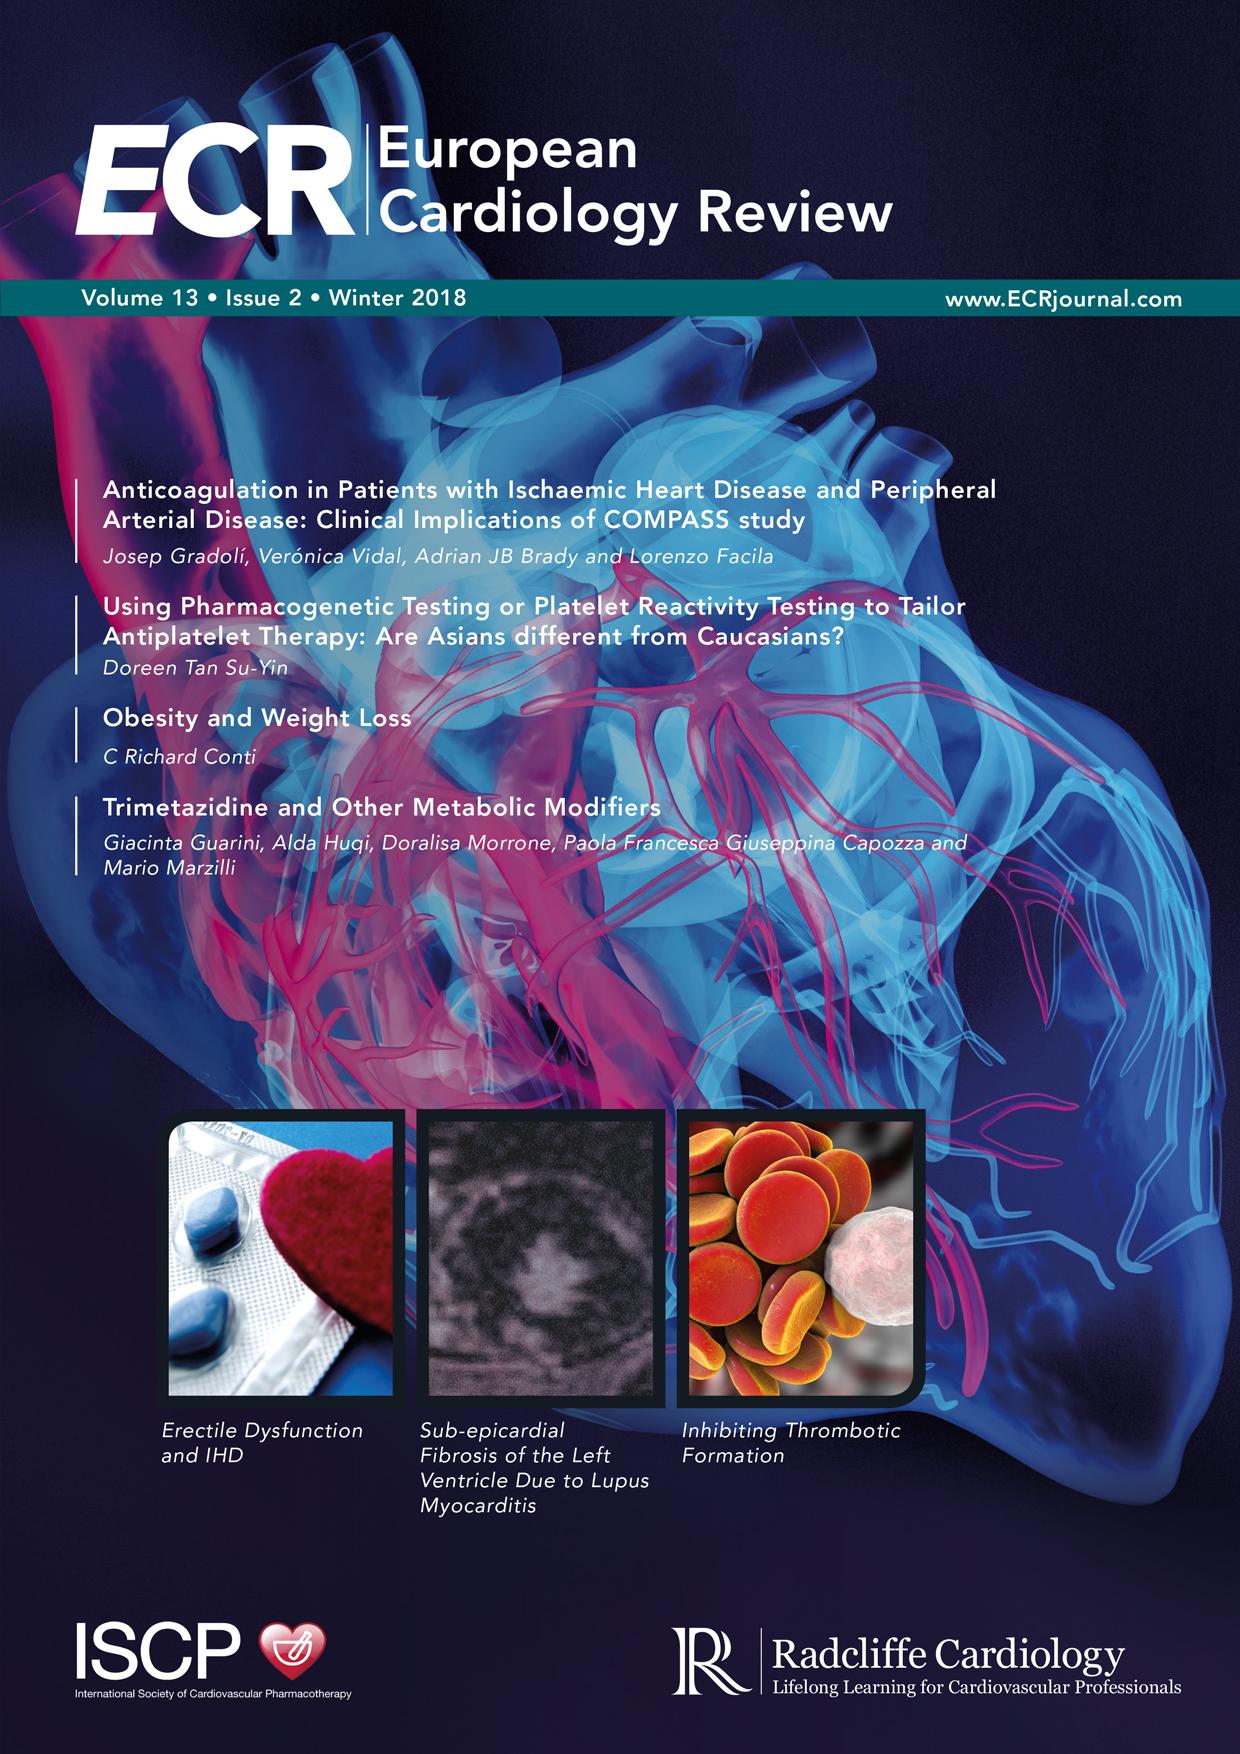 ECR - Volume 13 Issue 2 Winter 2018